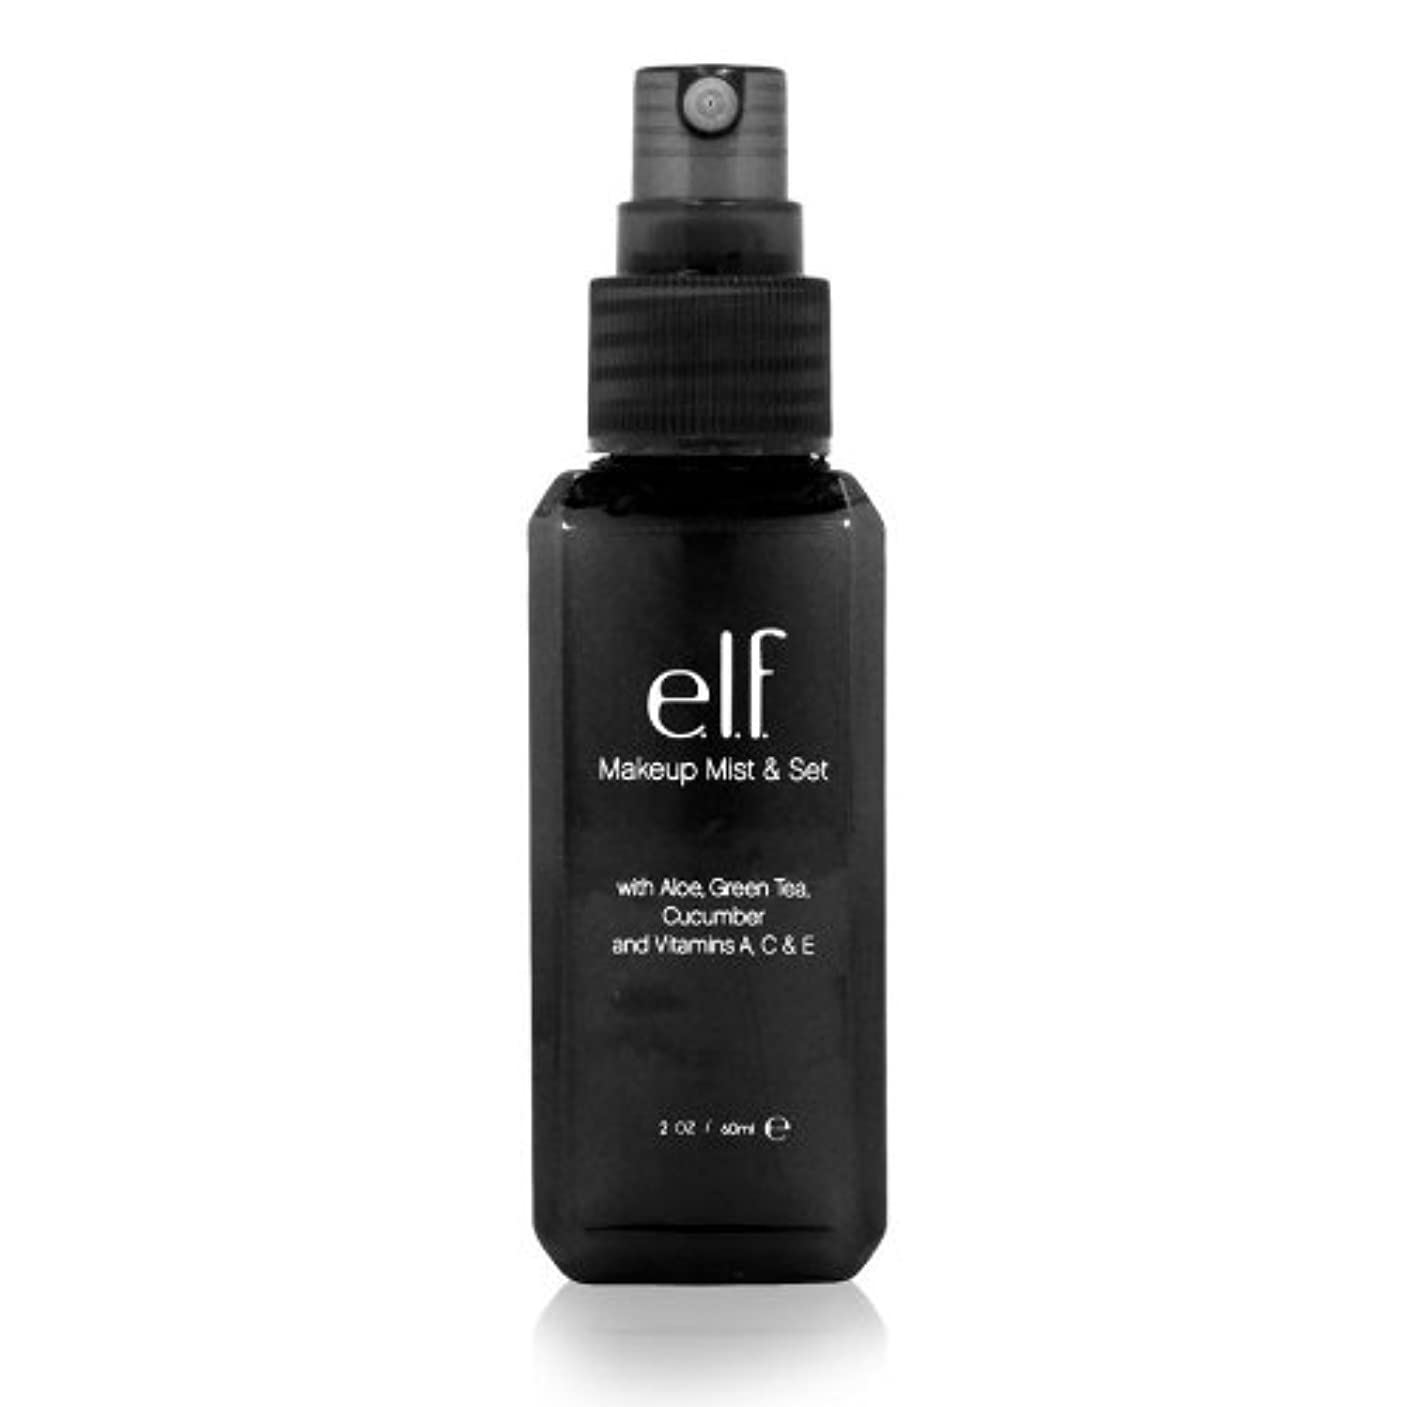 称賛適度な削減(3 Pack) e.l.f. Studio Makeup Mist & Set - Clear (並行輸入品)